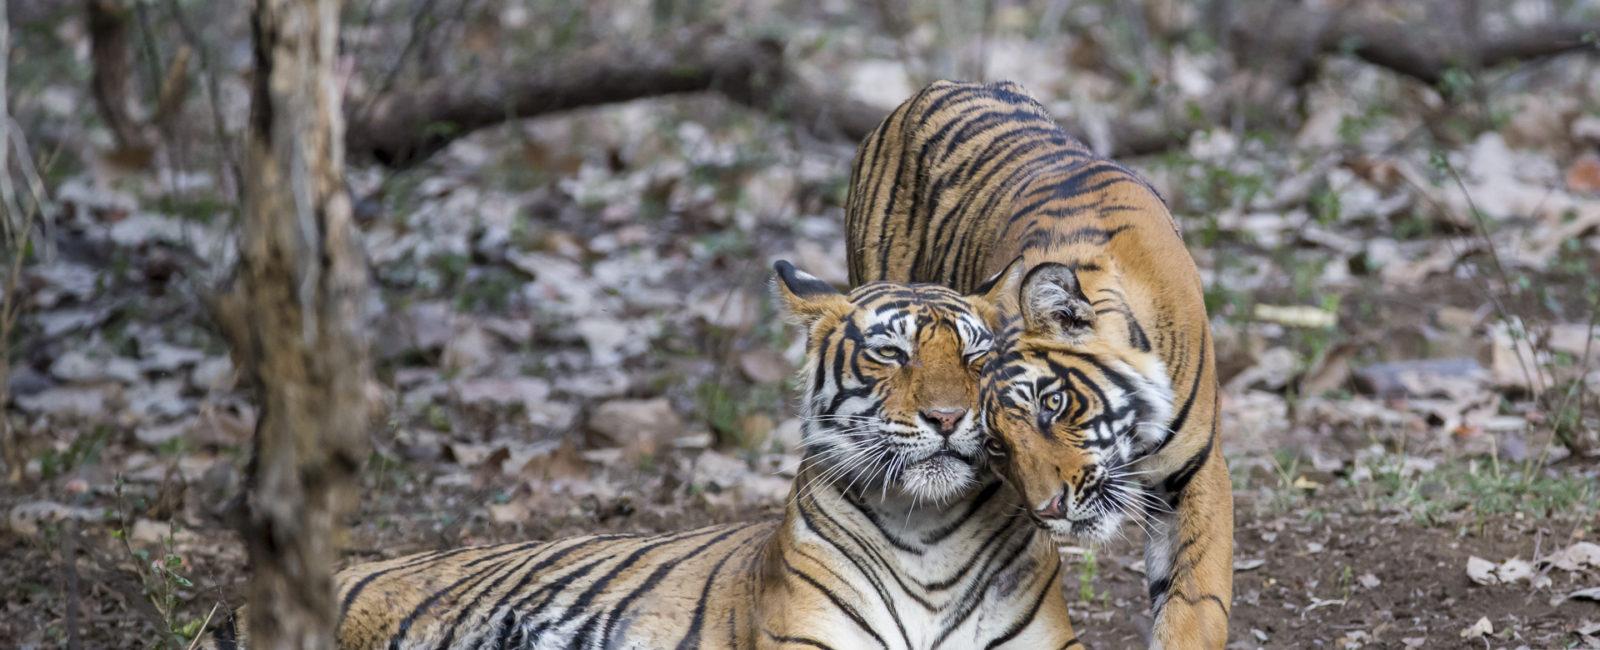 Permalink to The Tiger Safari Wrap up